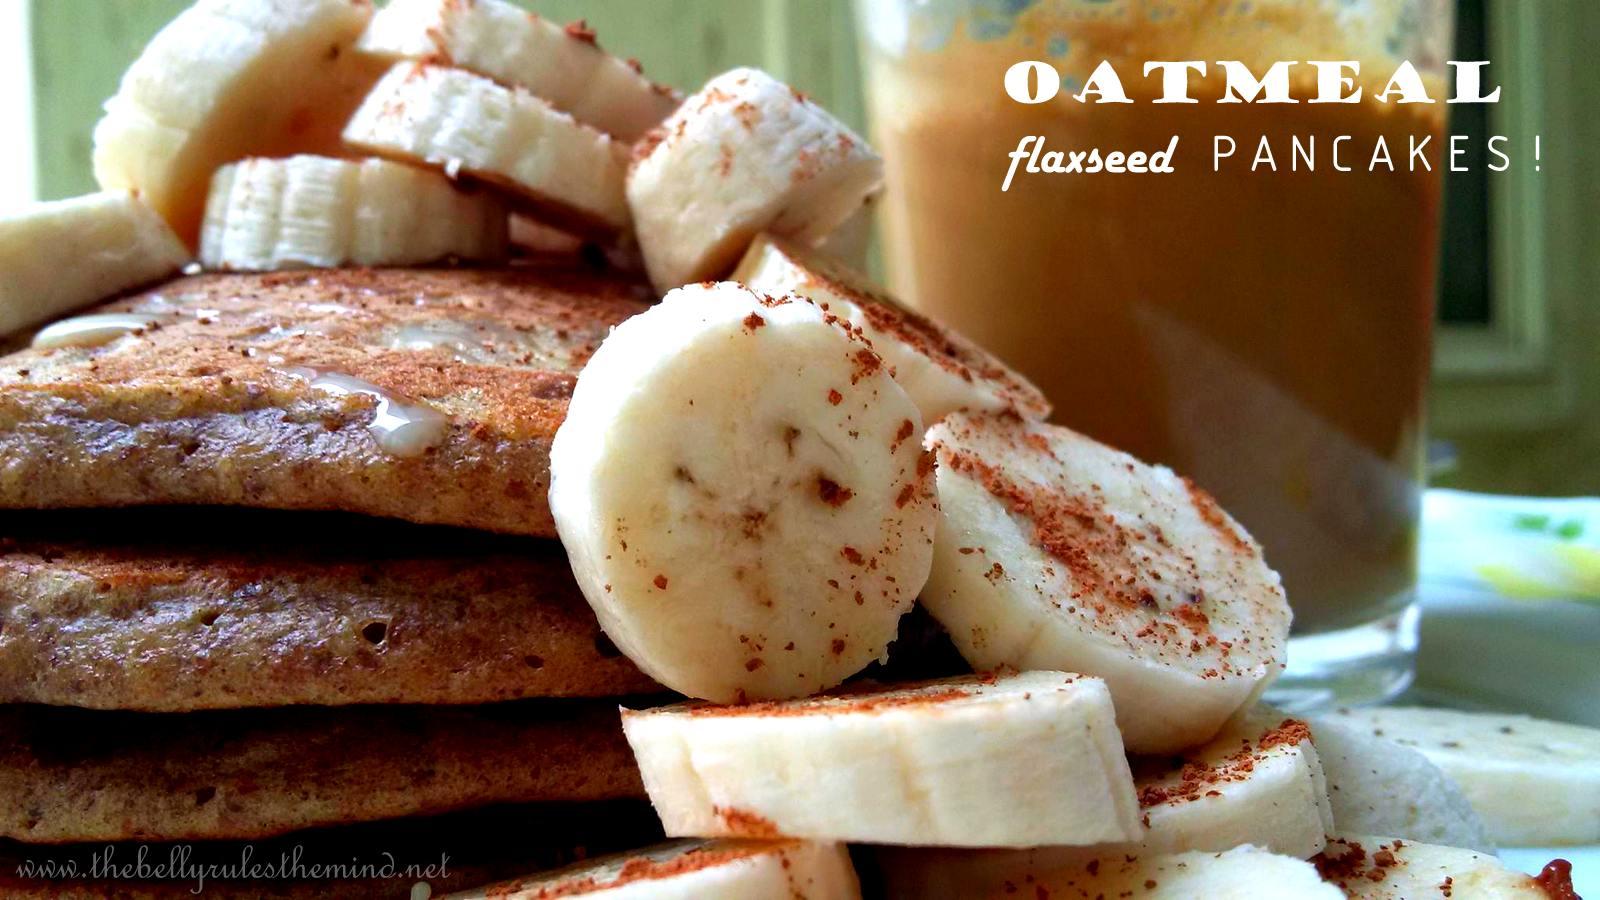 oatmeal flax seed pancakes